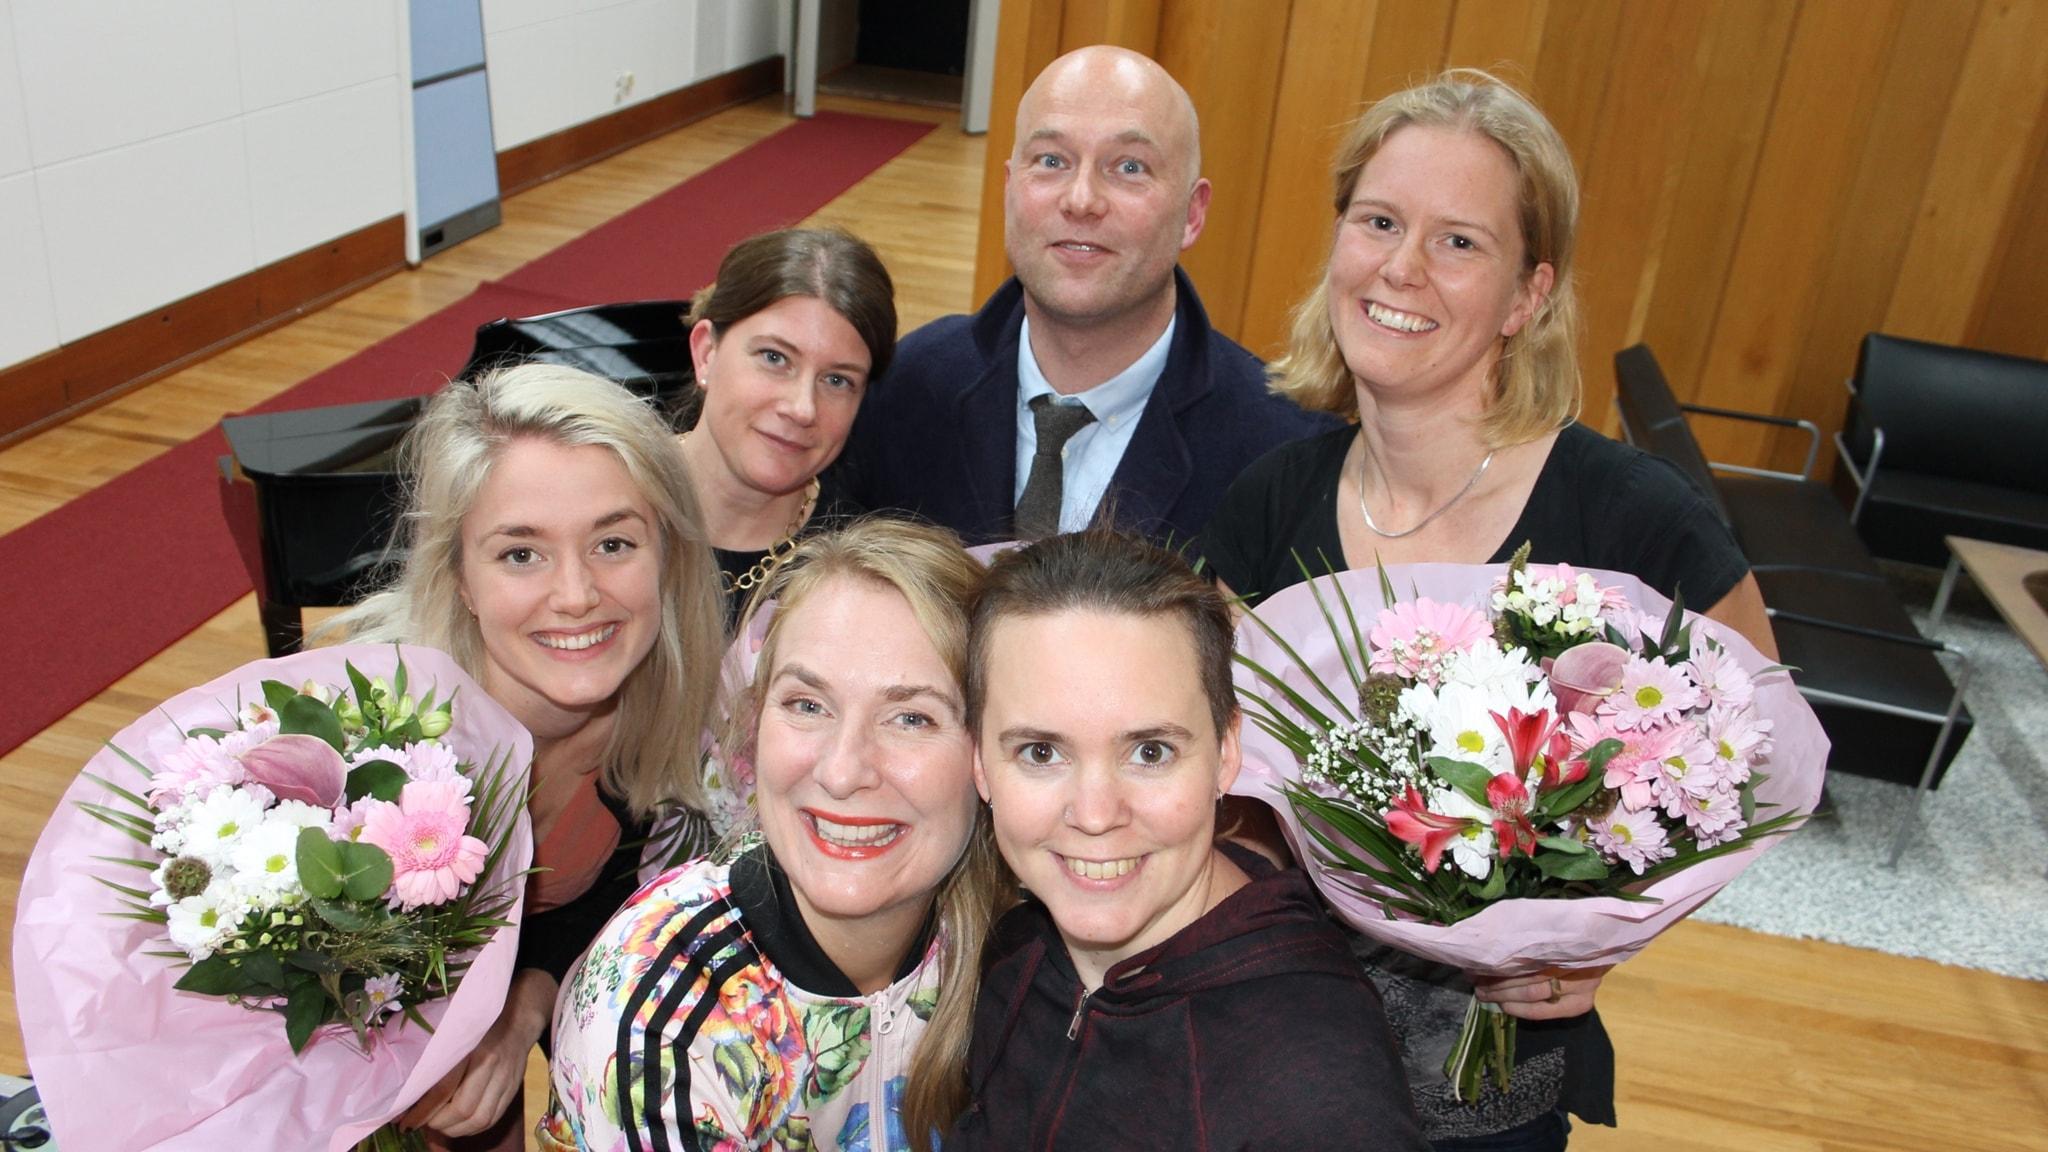 Maja Reichard, Amanda Lindholm, Ellen Lamm och Calle Marthin!